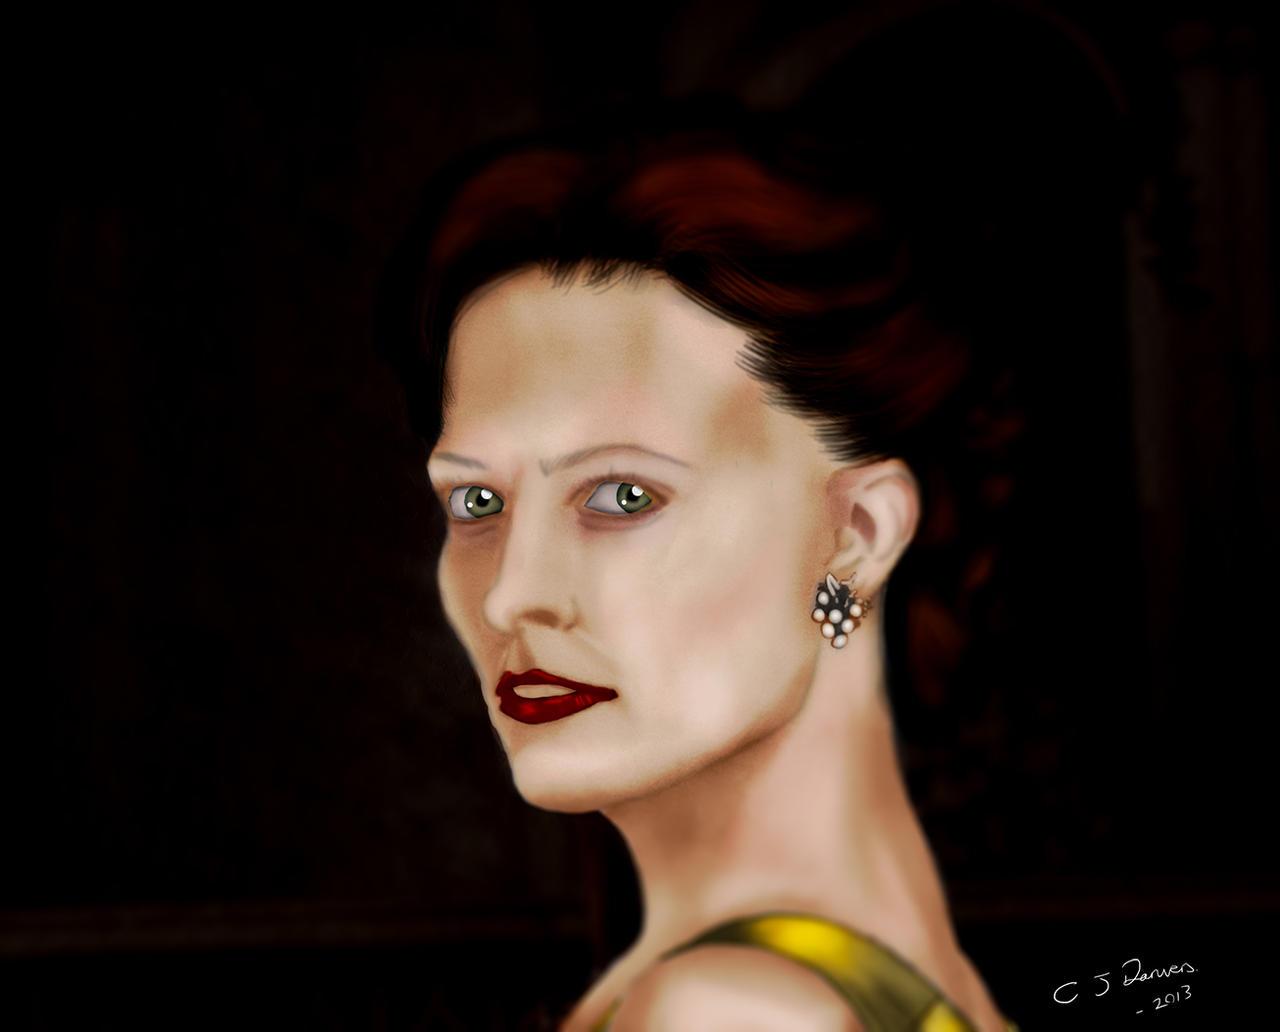 clarice orsini - photo #21